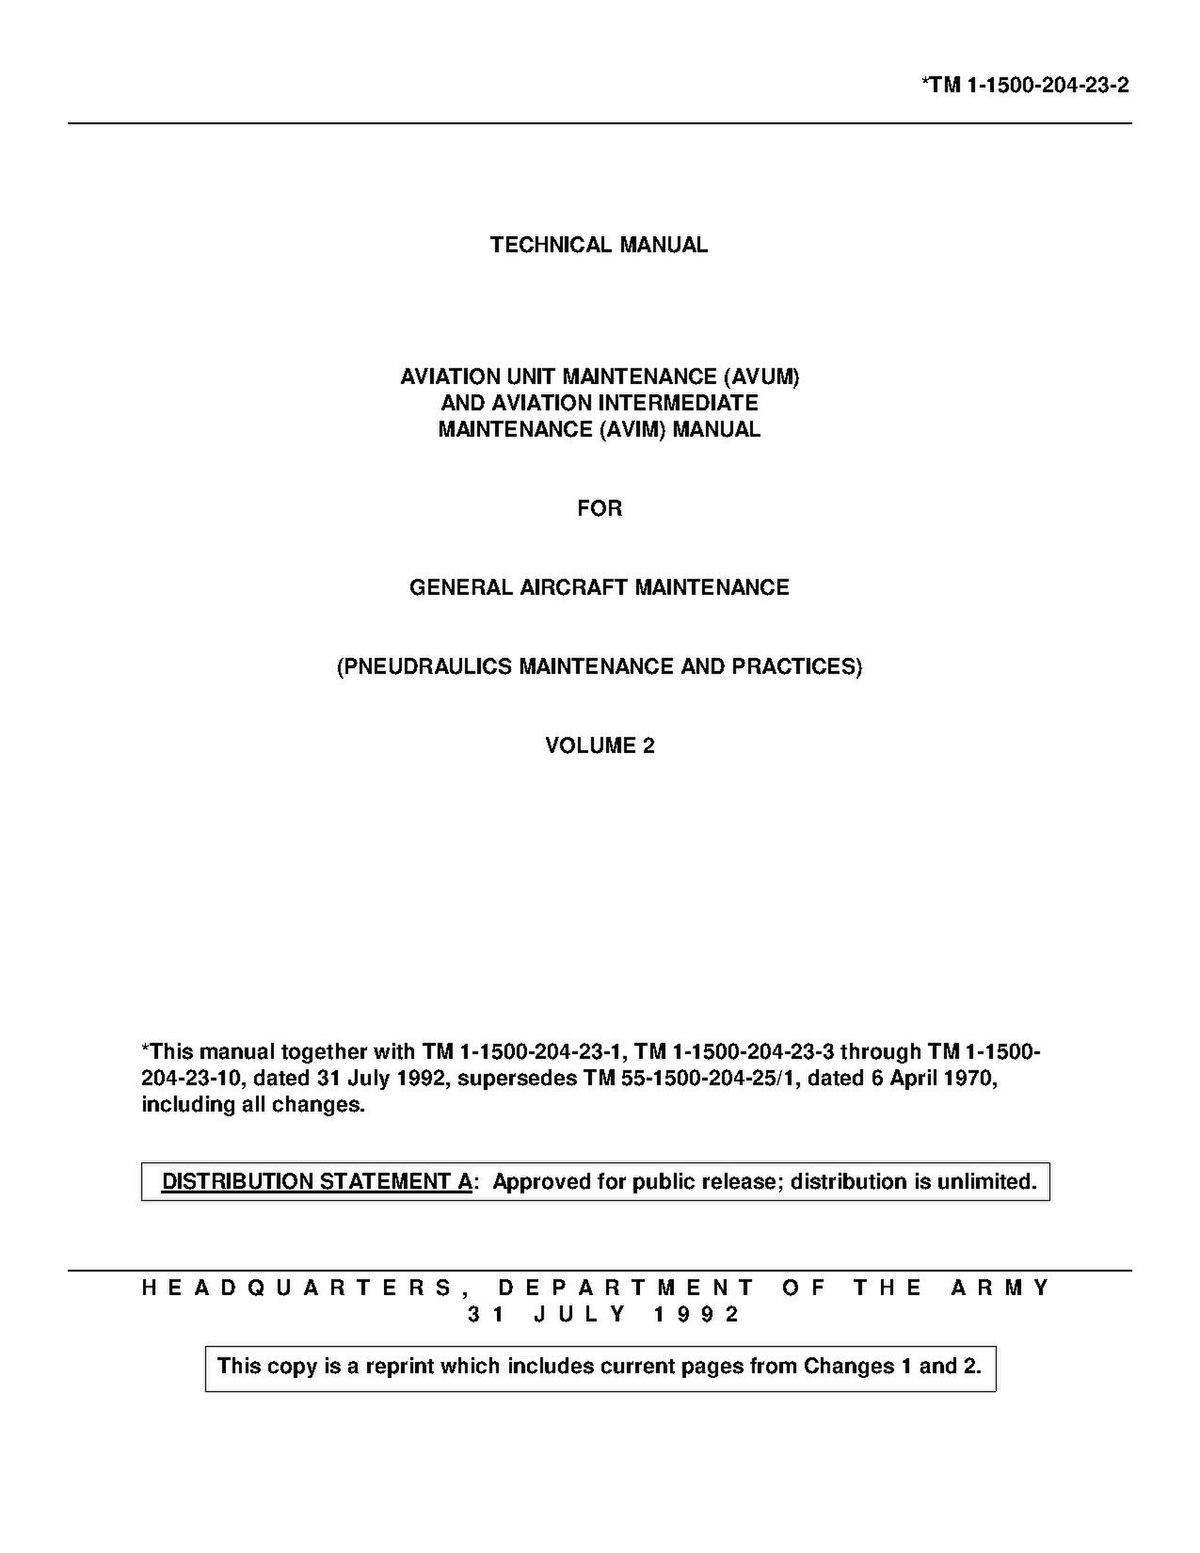 File:TM-1-1500-204-23-2.pdf - Wikimedia Commons